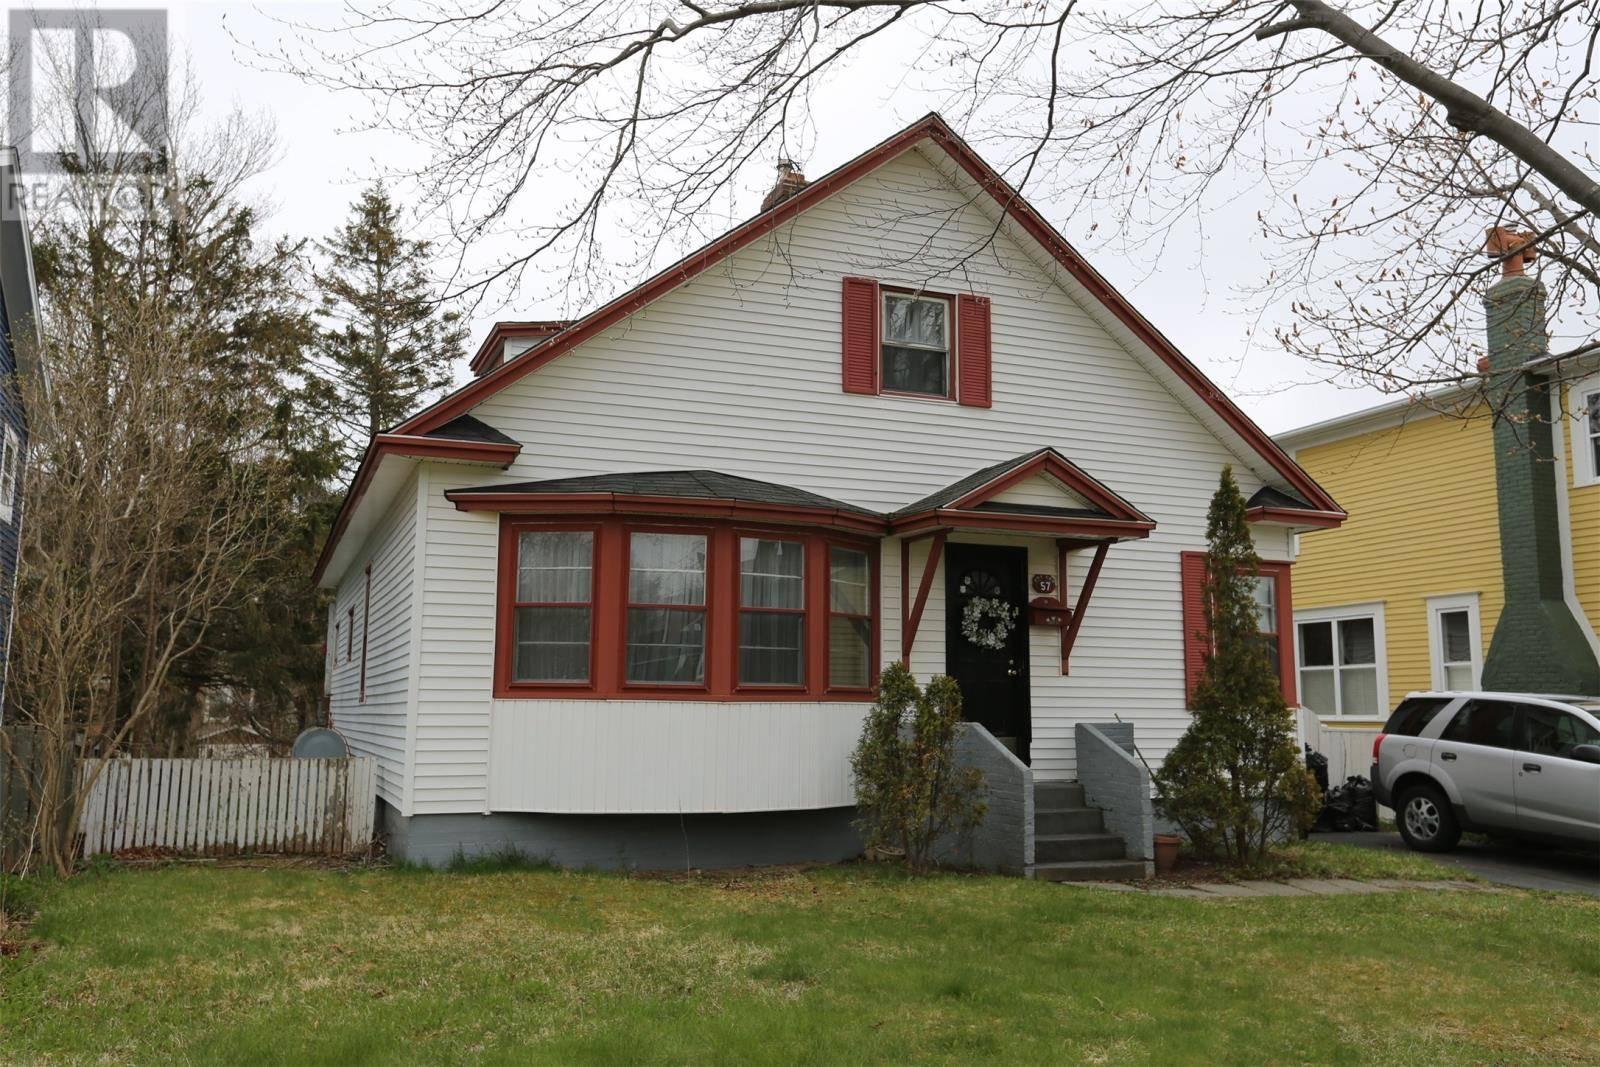 House for sale at 57 Poplar Ave St. John's Newfoundland - MLS: 1200561